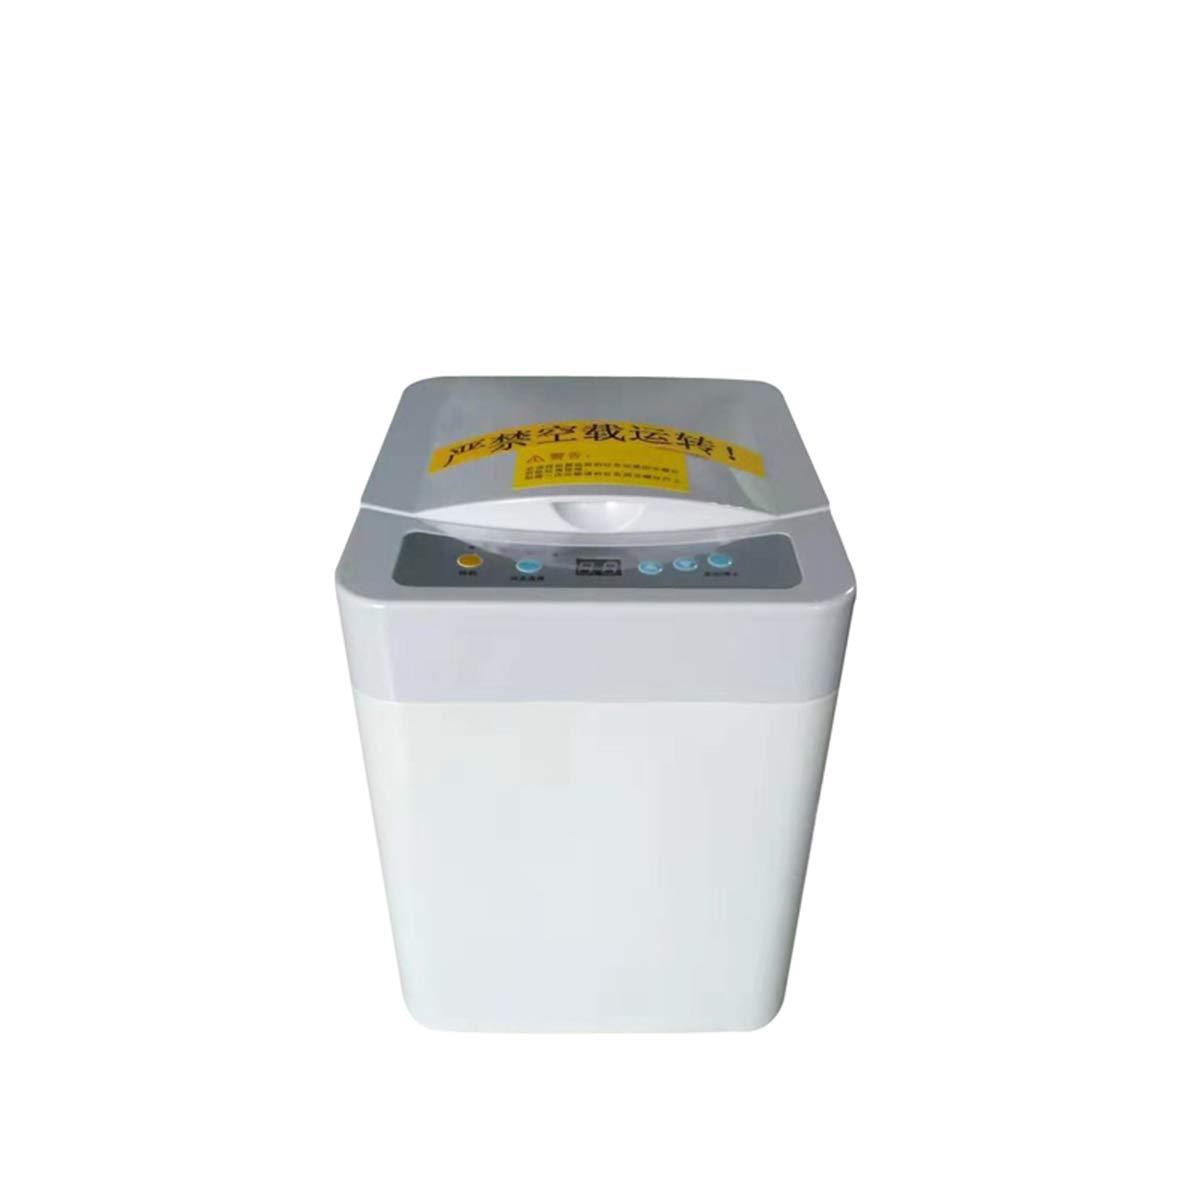 TJIRIS Fully-Automatic Alginate Mixer Machine Mixing (220V)